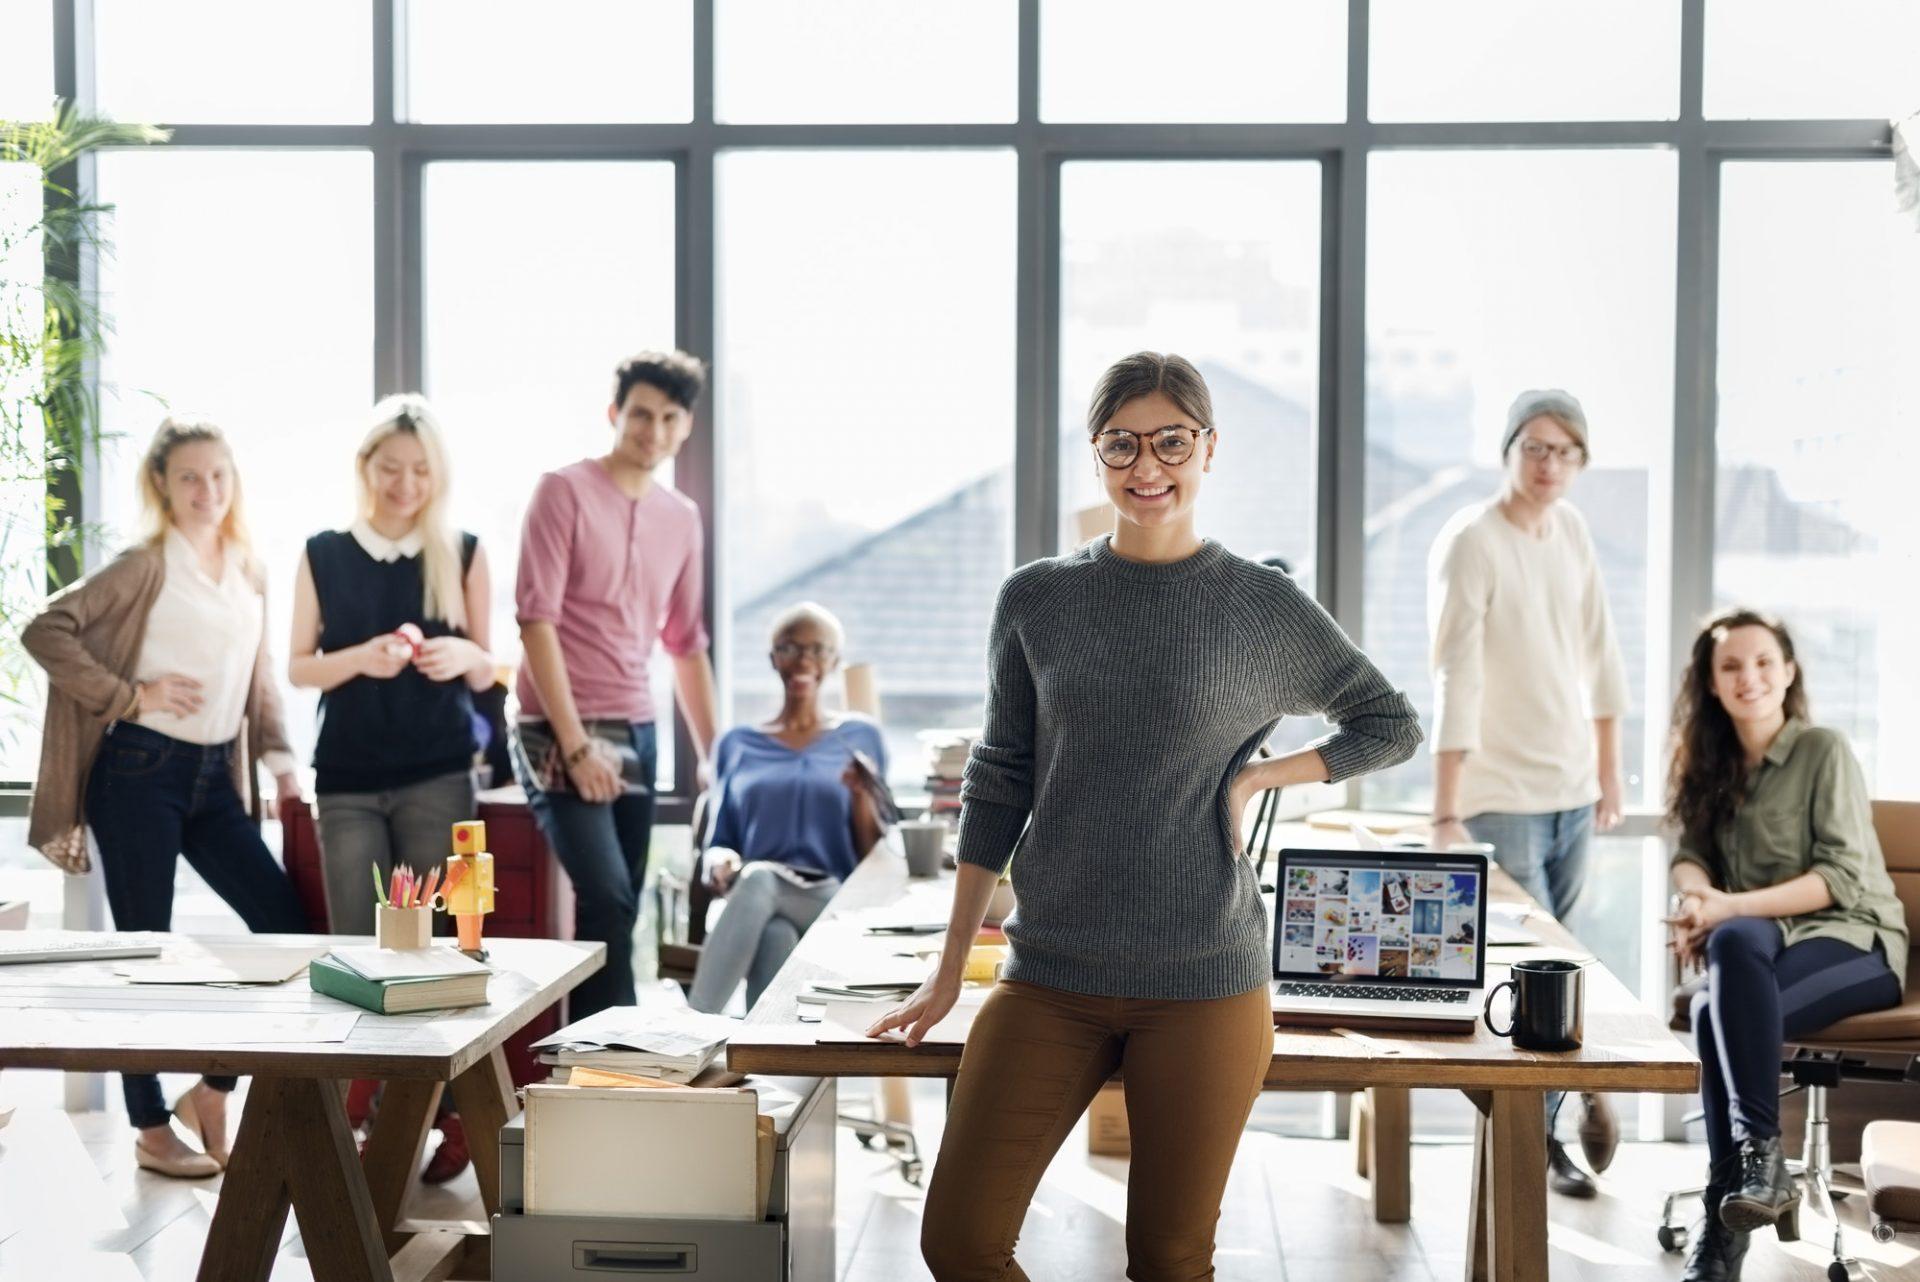 Business Team Brainstorming Workspace Concept